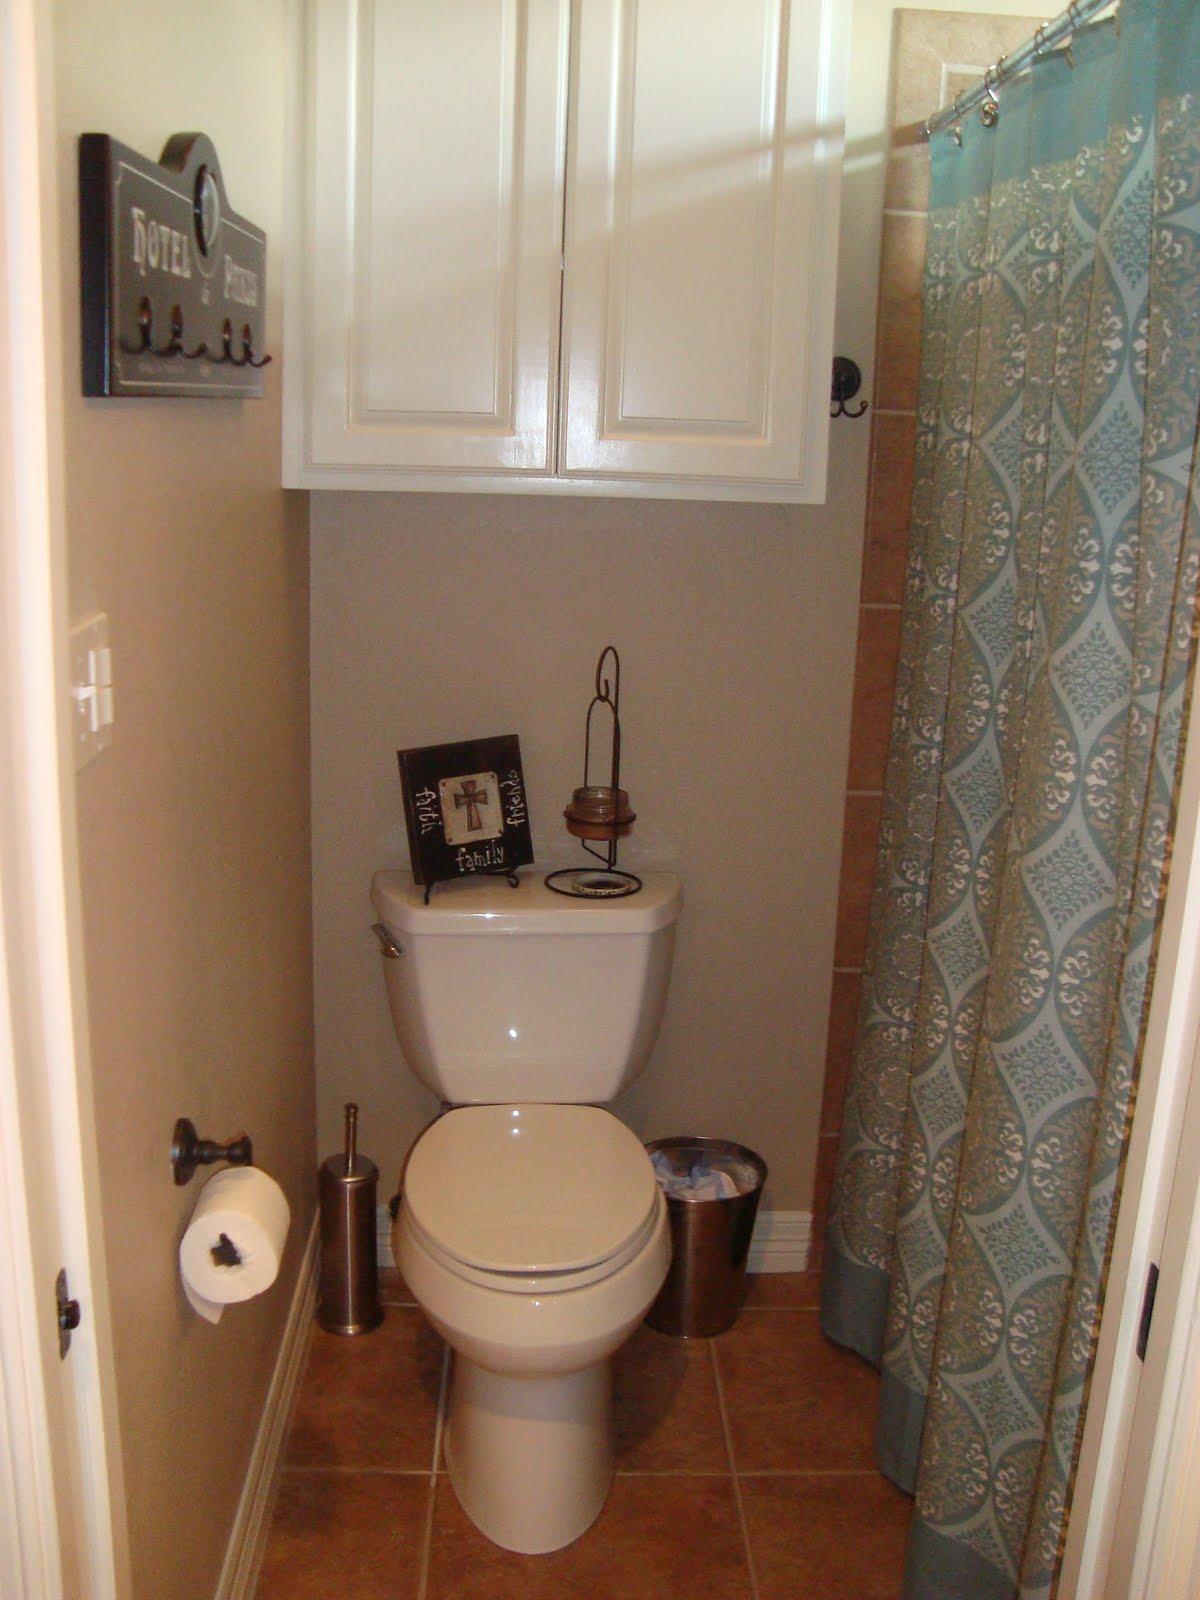 My Precious Family Bathroom Redecorating And Big Girl -3181